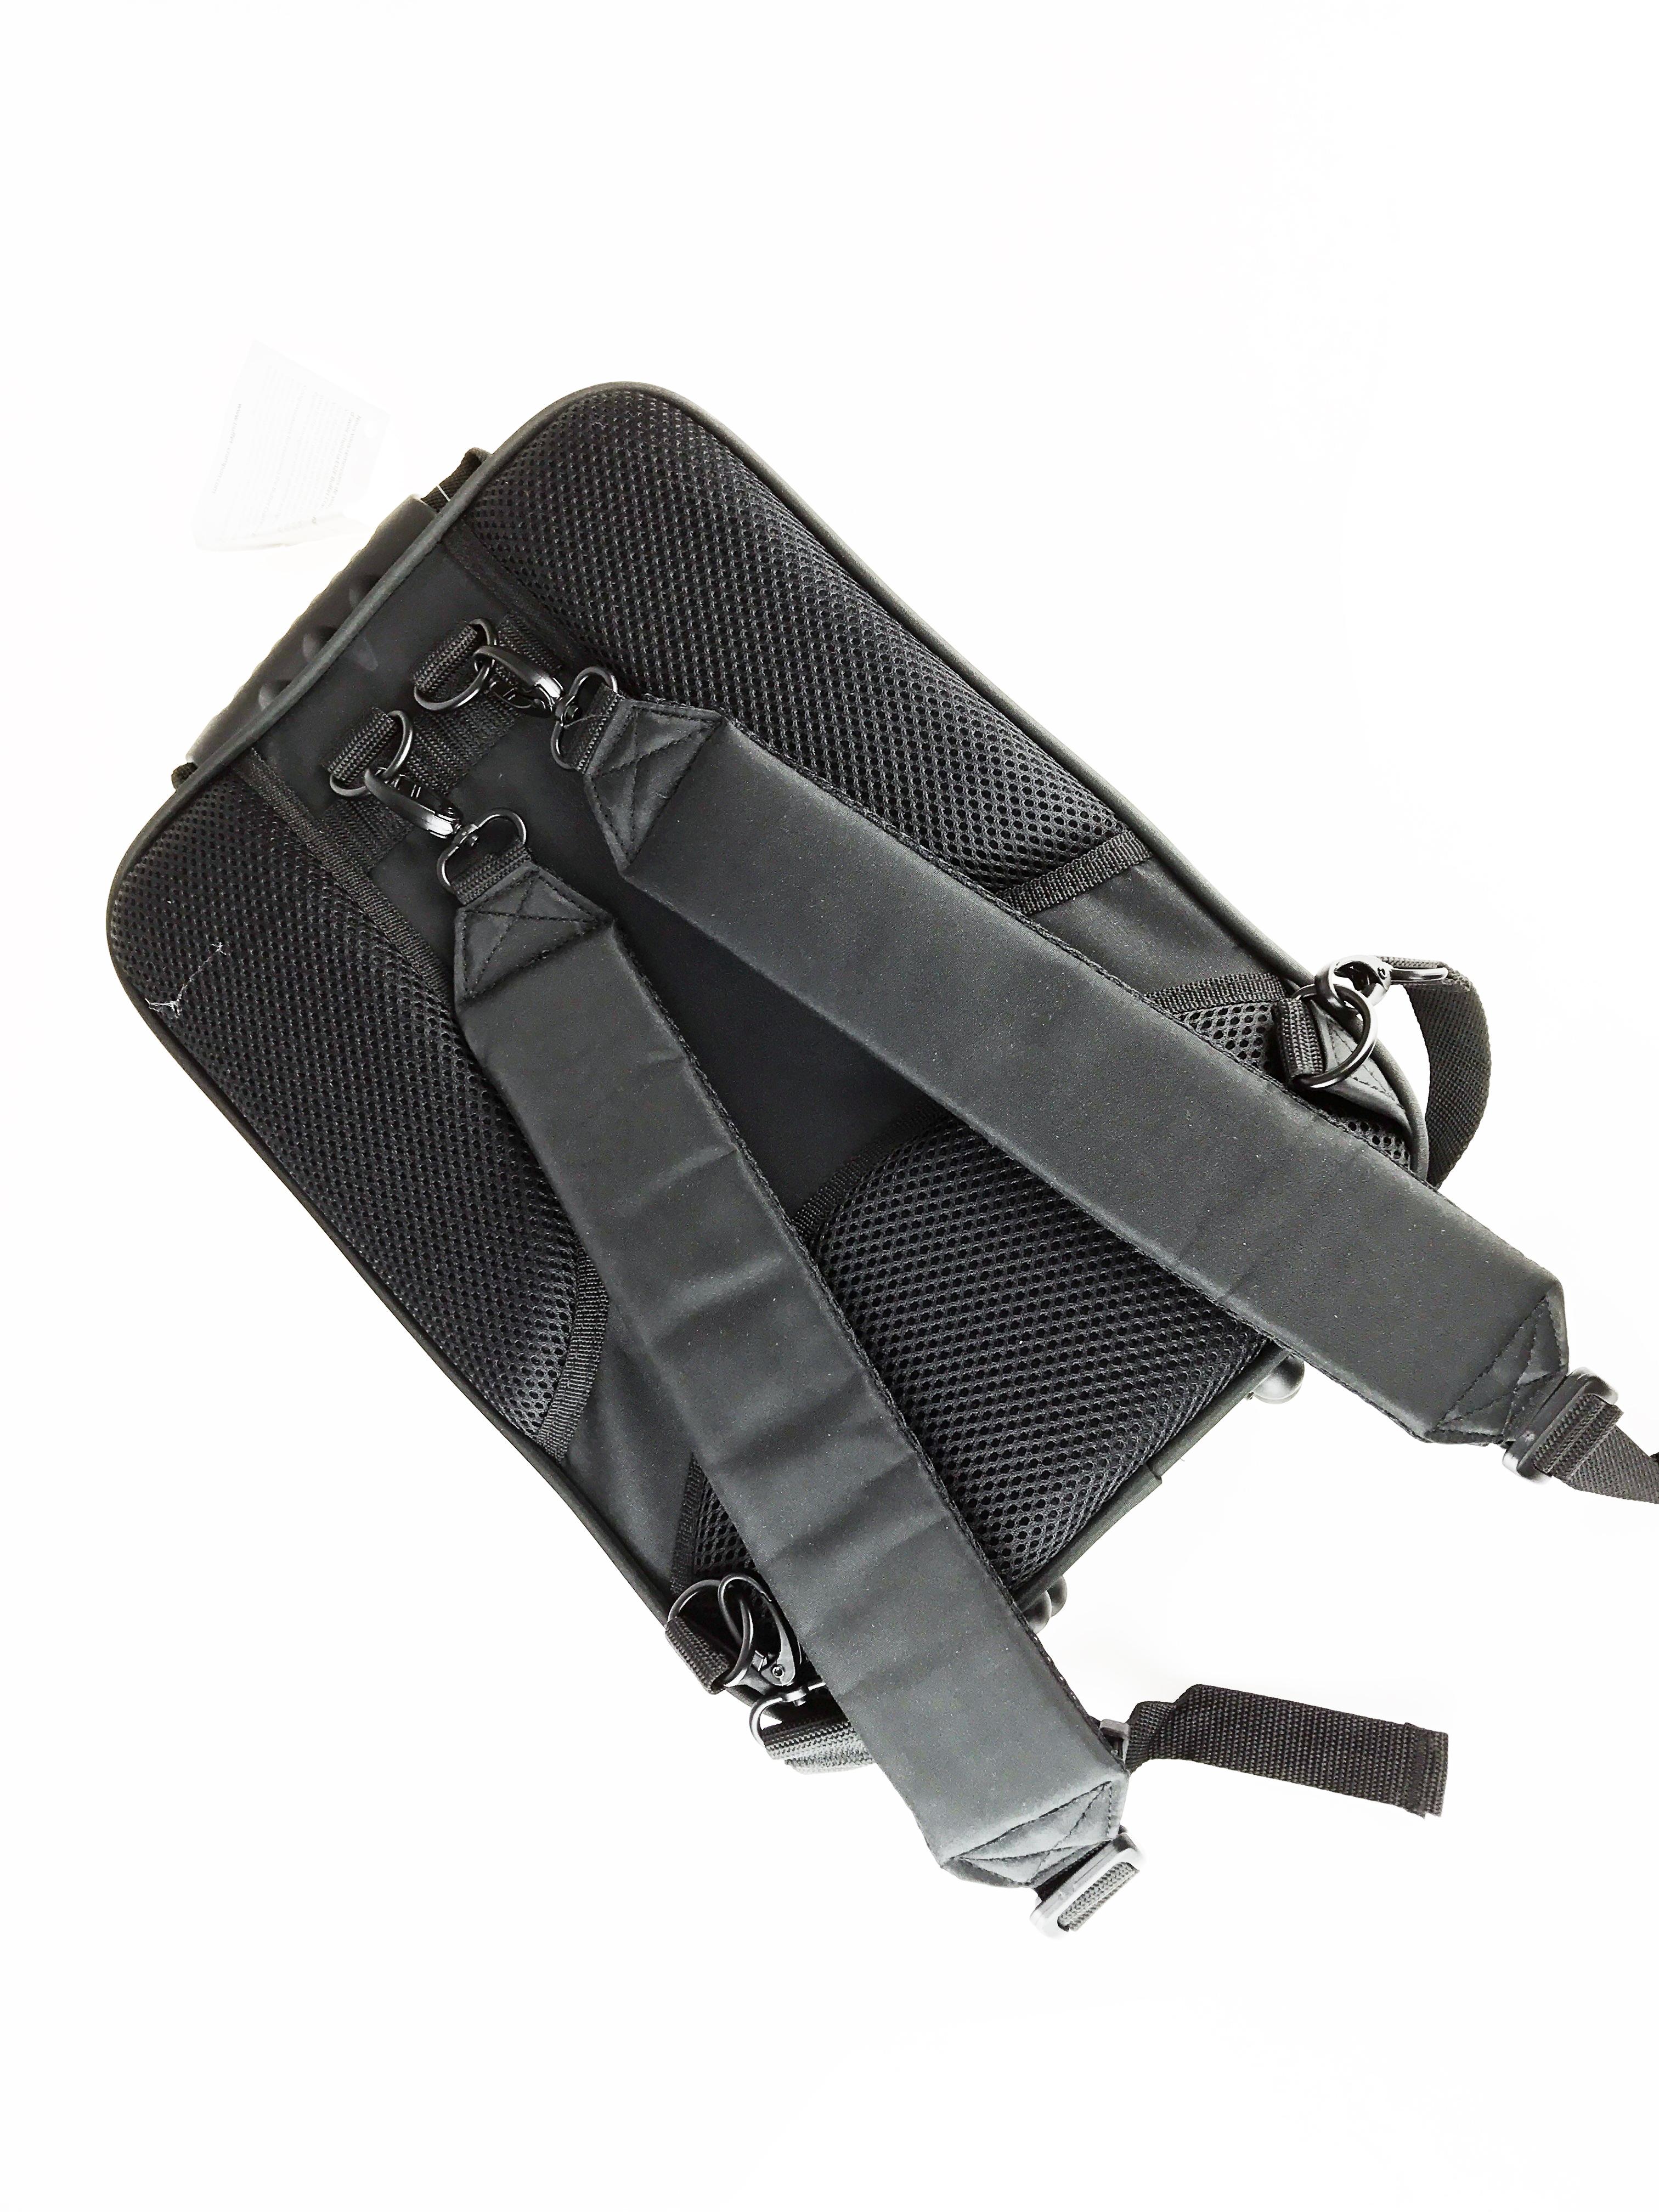 Back side of Buffet E12F Backpack Case